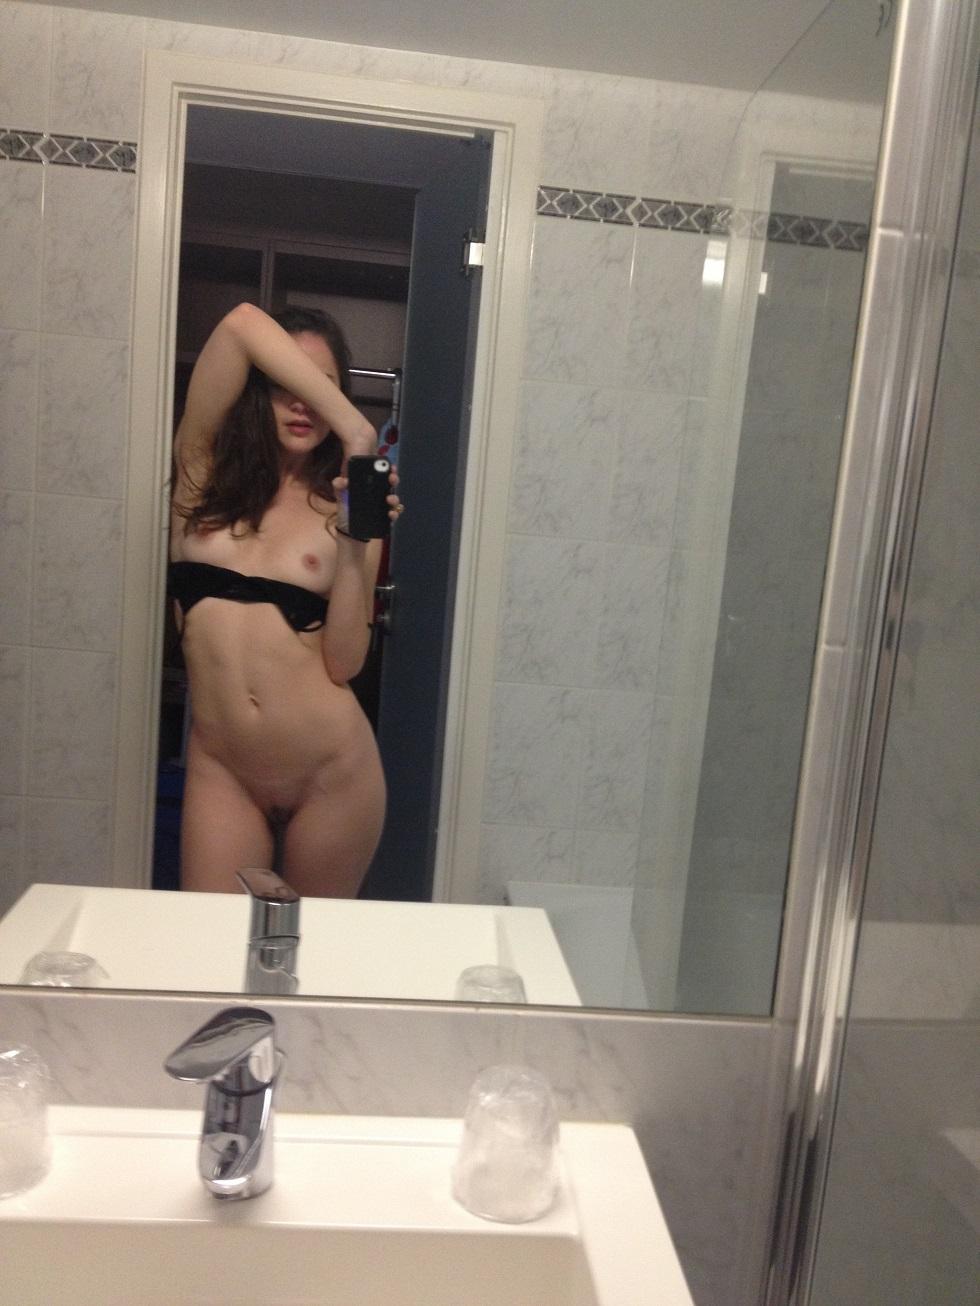 alexa2 - Alexa Nikolas naked